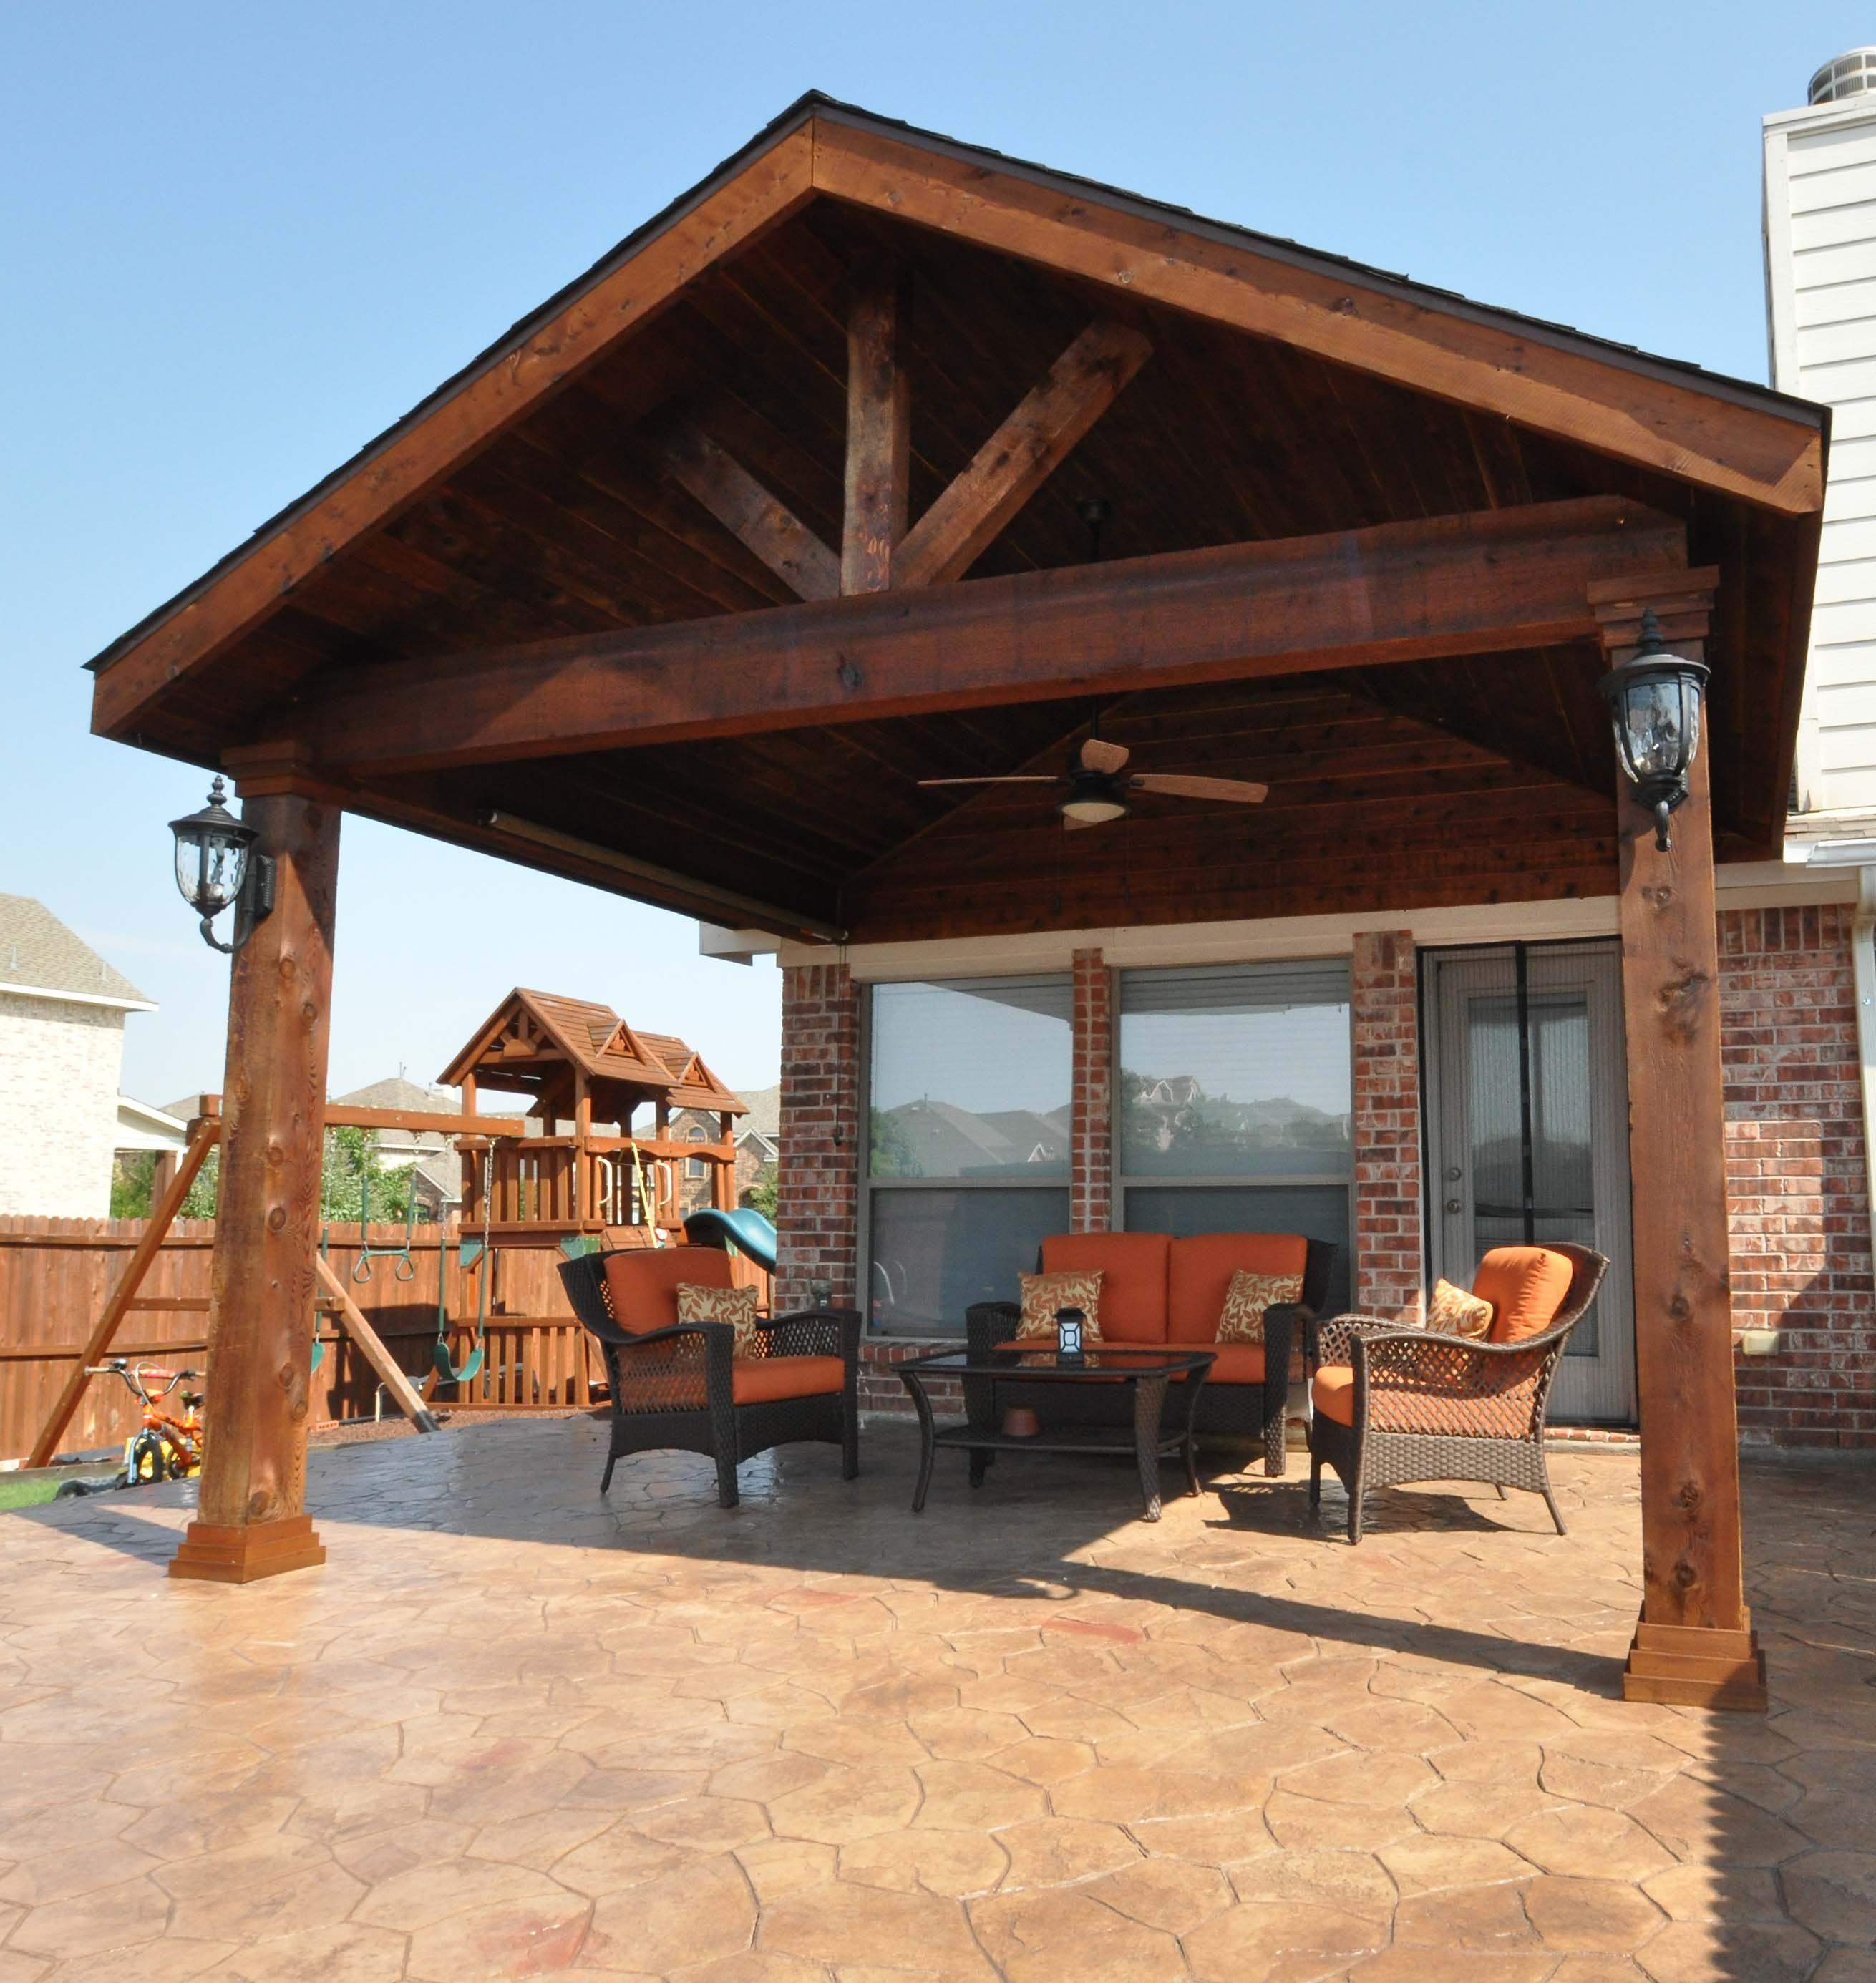 Patio Garden Ideas For Every Space: Every Home Deserves A Special Outdoor Living Space. No